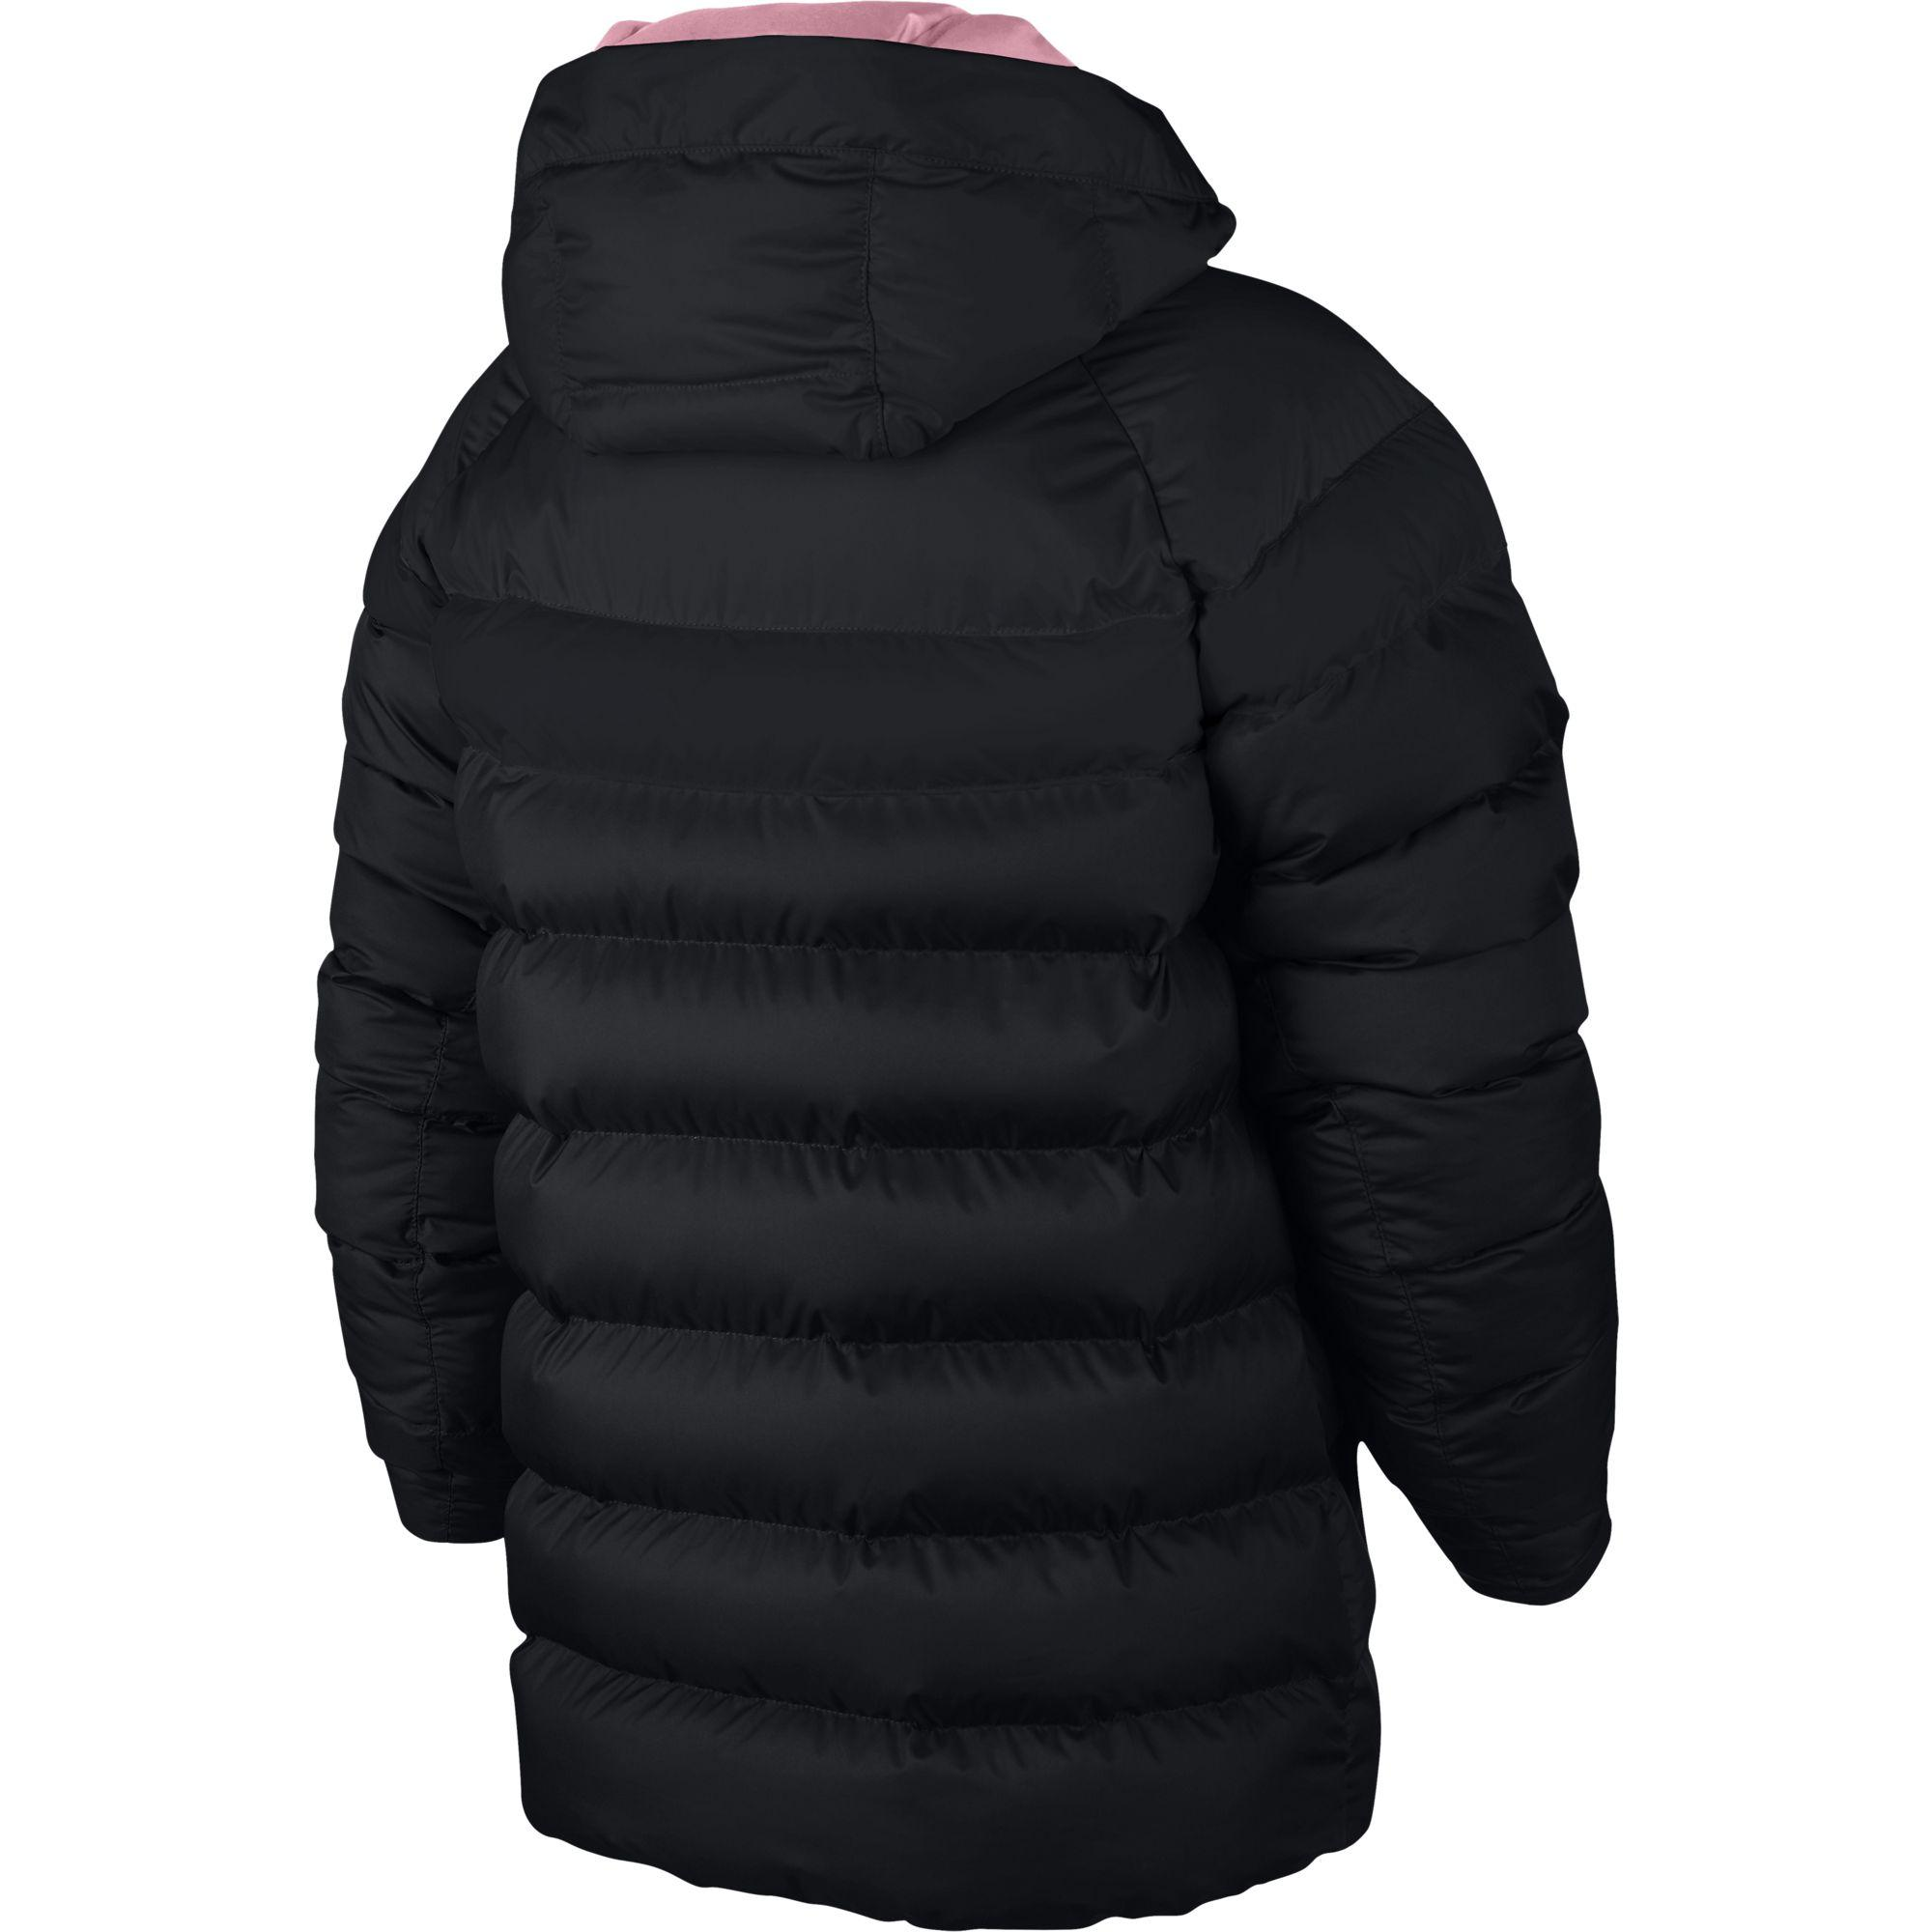 4934c3bd1 Nike Kids Sportswear Synthetic Fill Jacket - Black/Pink - Tennisnuts.com